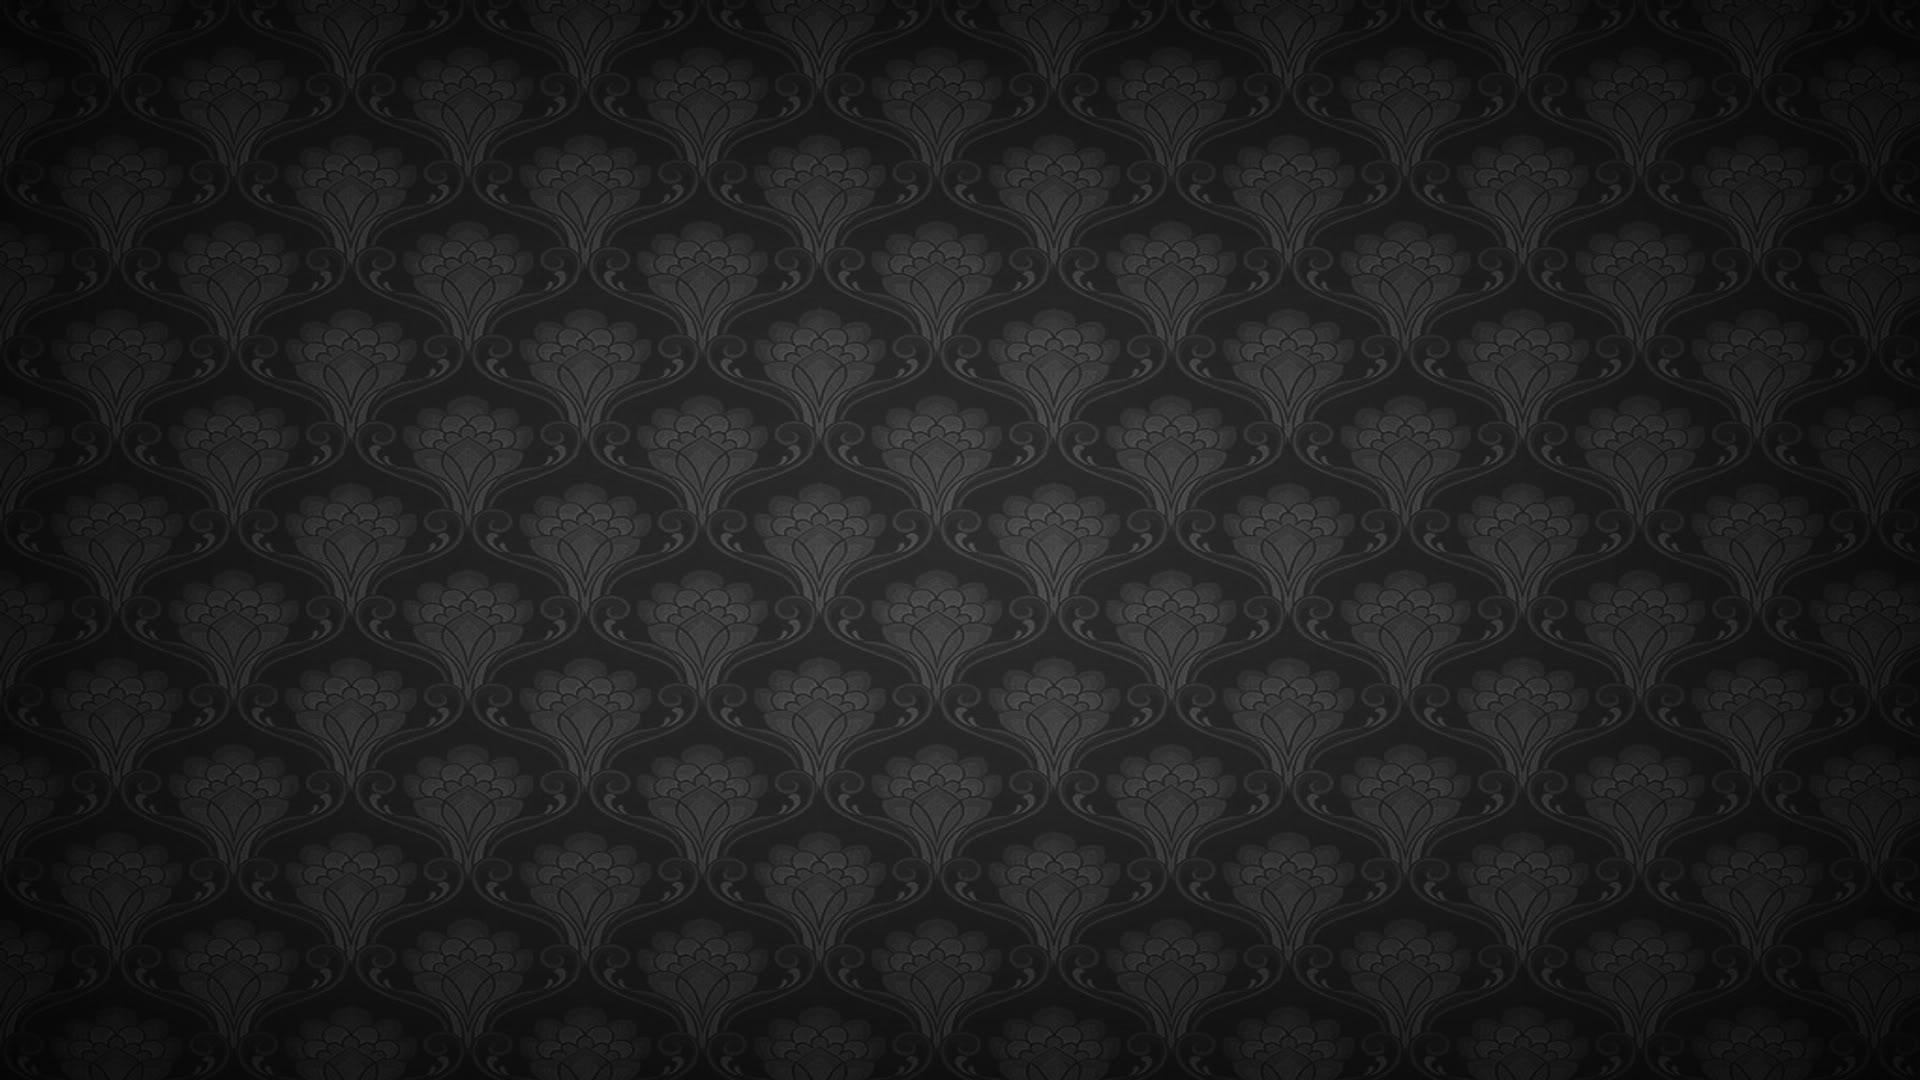 44] Wallpaper for Website Background on WallpaperSafari 1920x1080